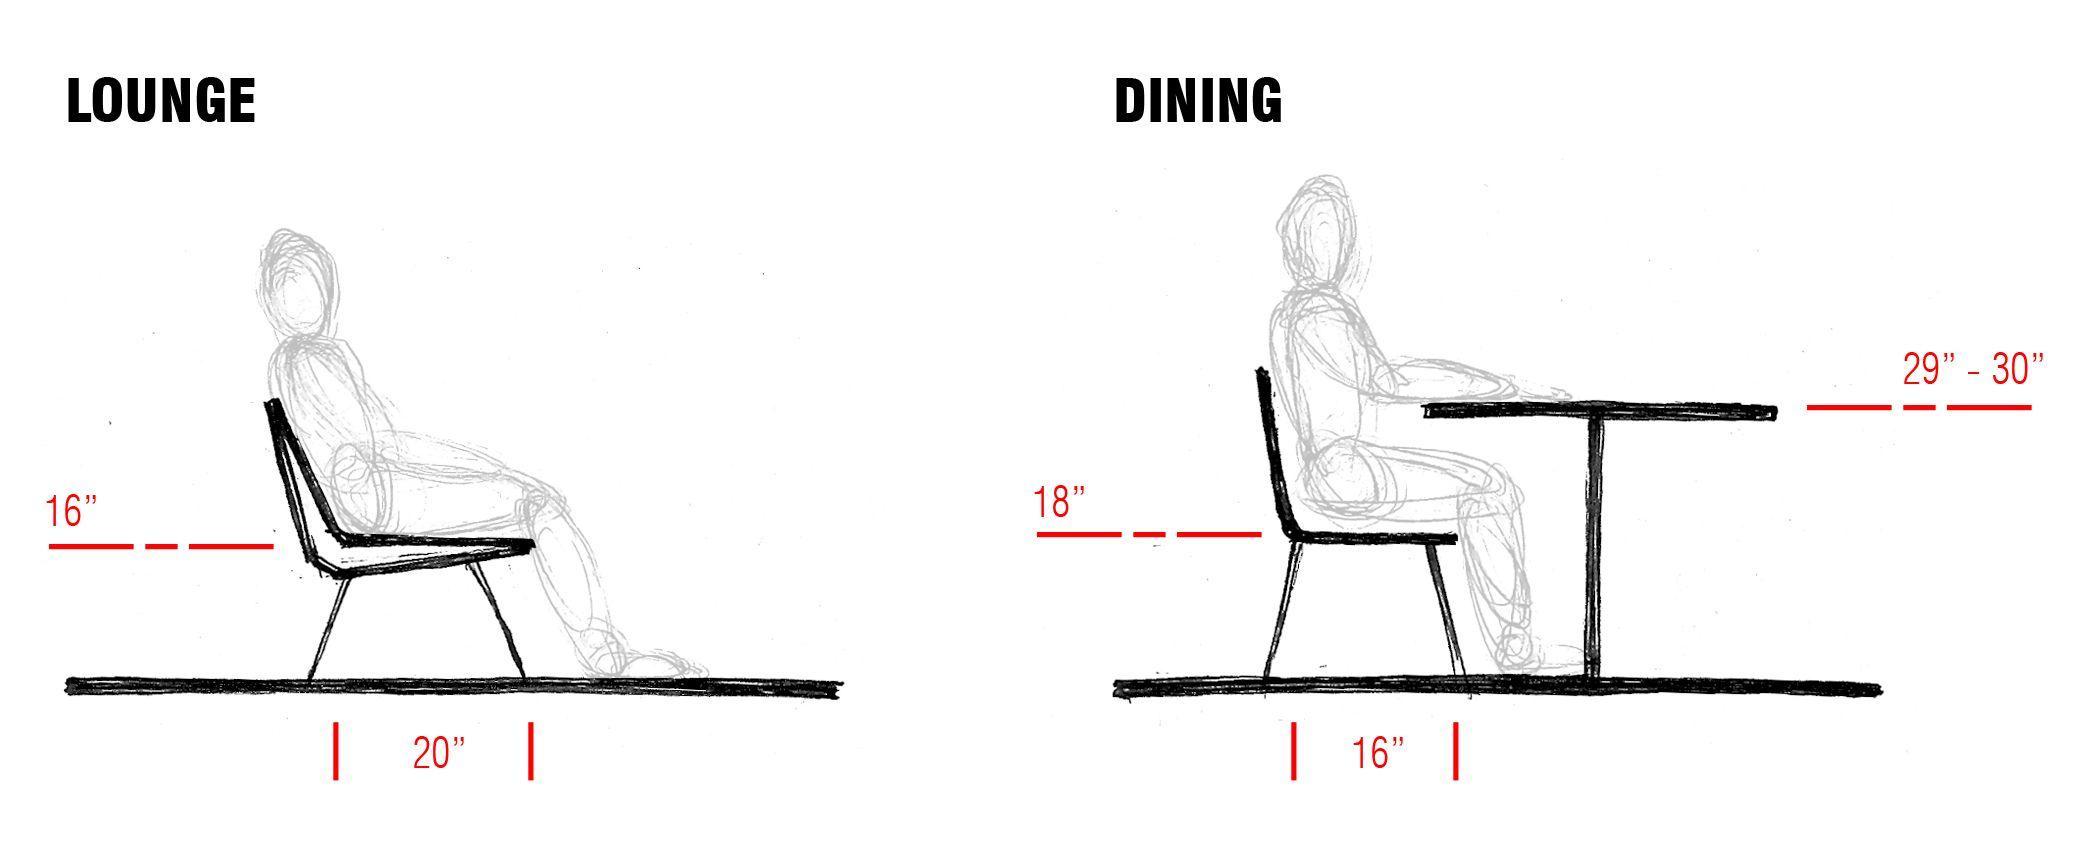 Standard Coffee Table Height Coffee Table Height Table Height Average Coffee Table Height